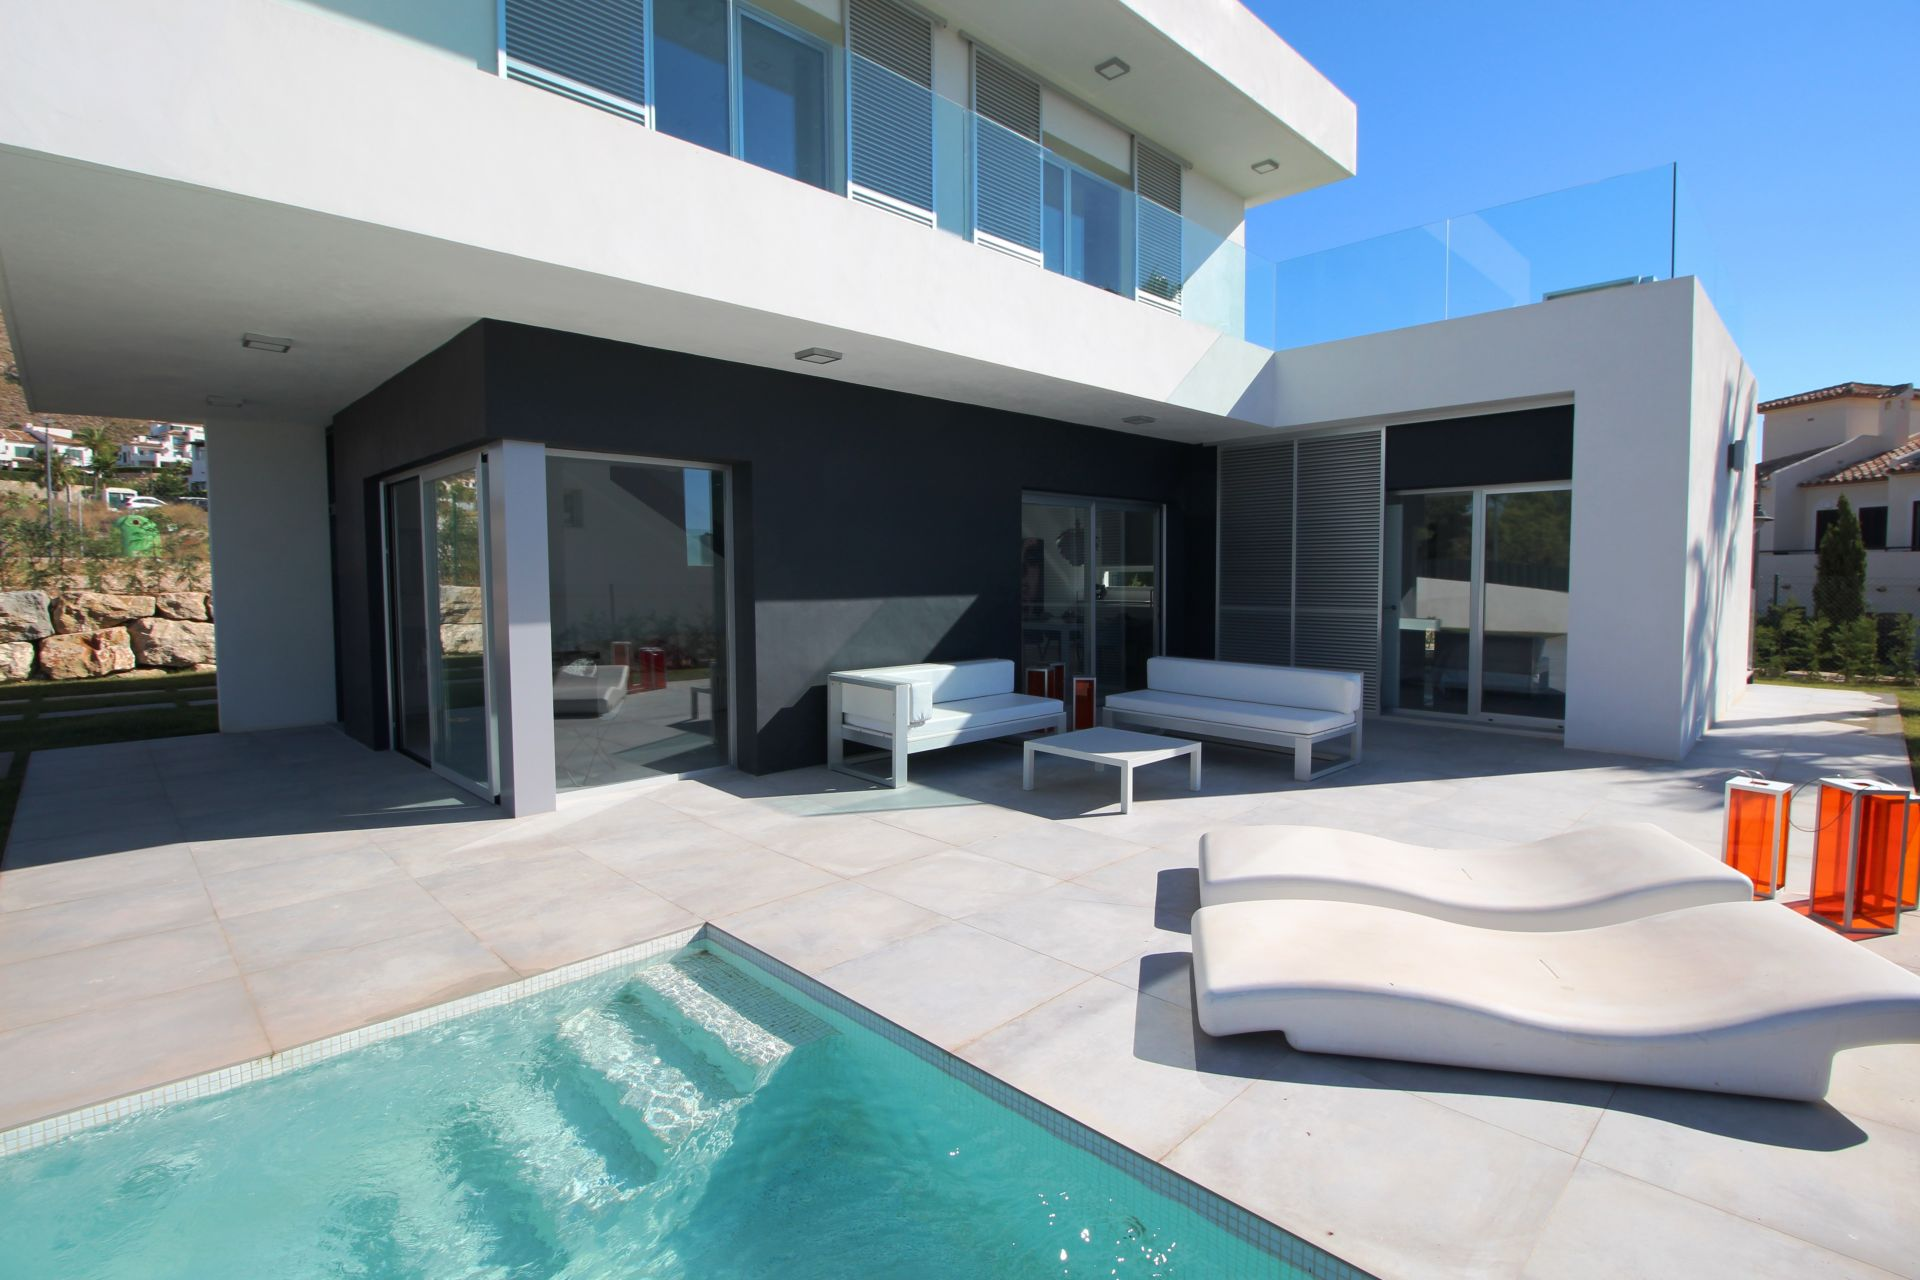 Exclusive villas with 3 bedrooms in Finestrat 2